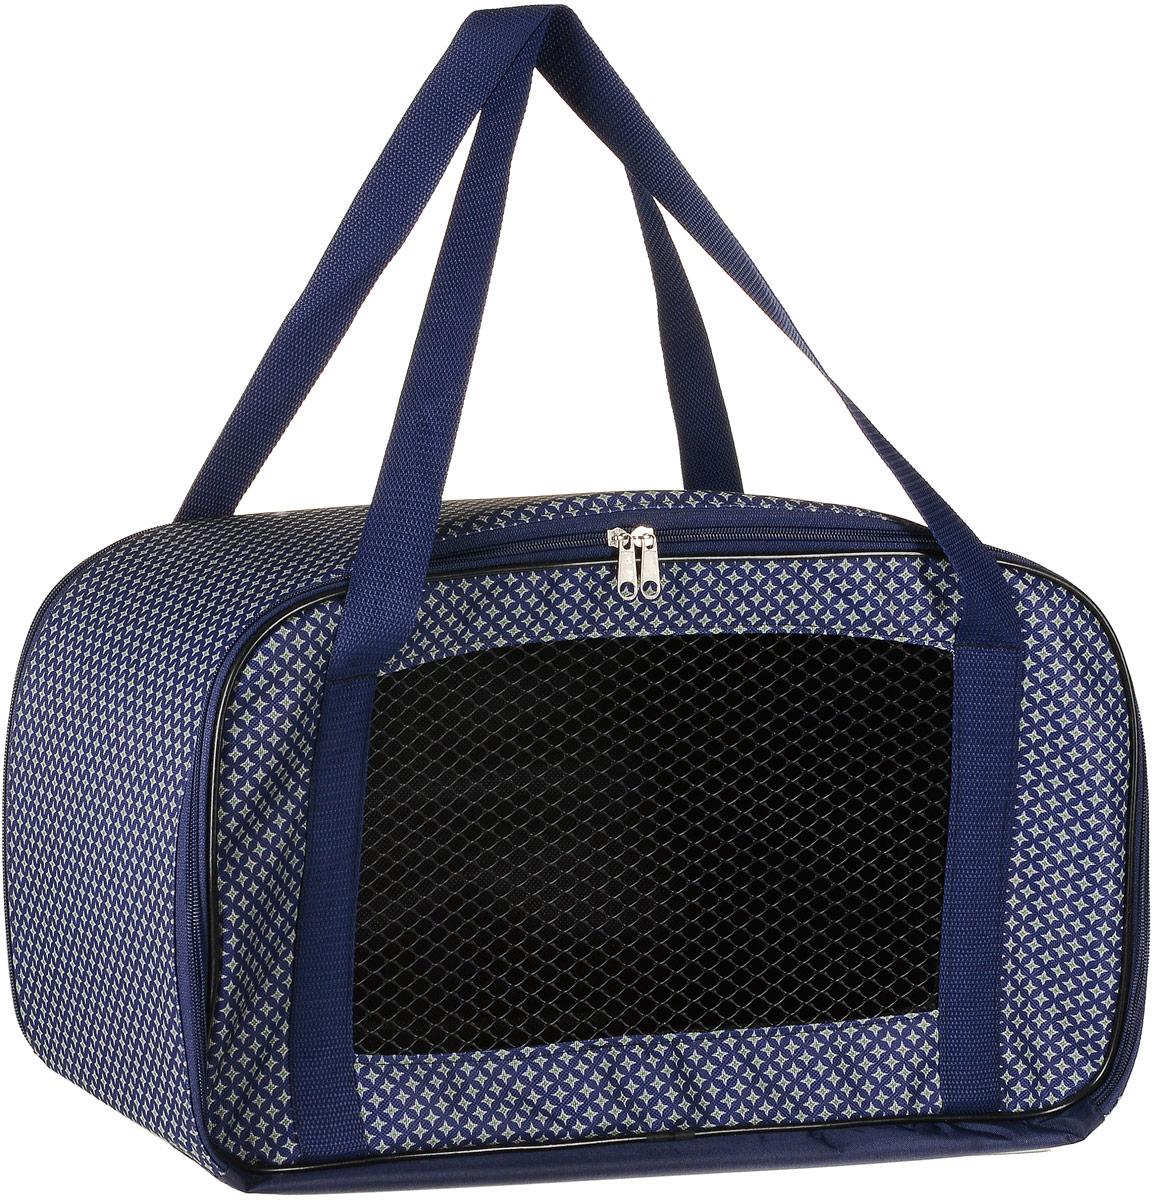 Сумка-переноска для животных Теремок, цвет: синий, 47 х 24 х 22 см сумка переноска гамма для животных с сеткой цвет красный в горошек 35 см х 20 см х 24 см